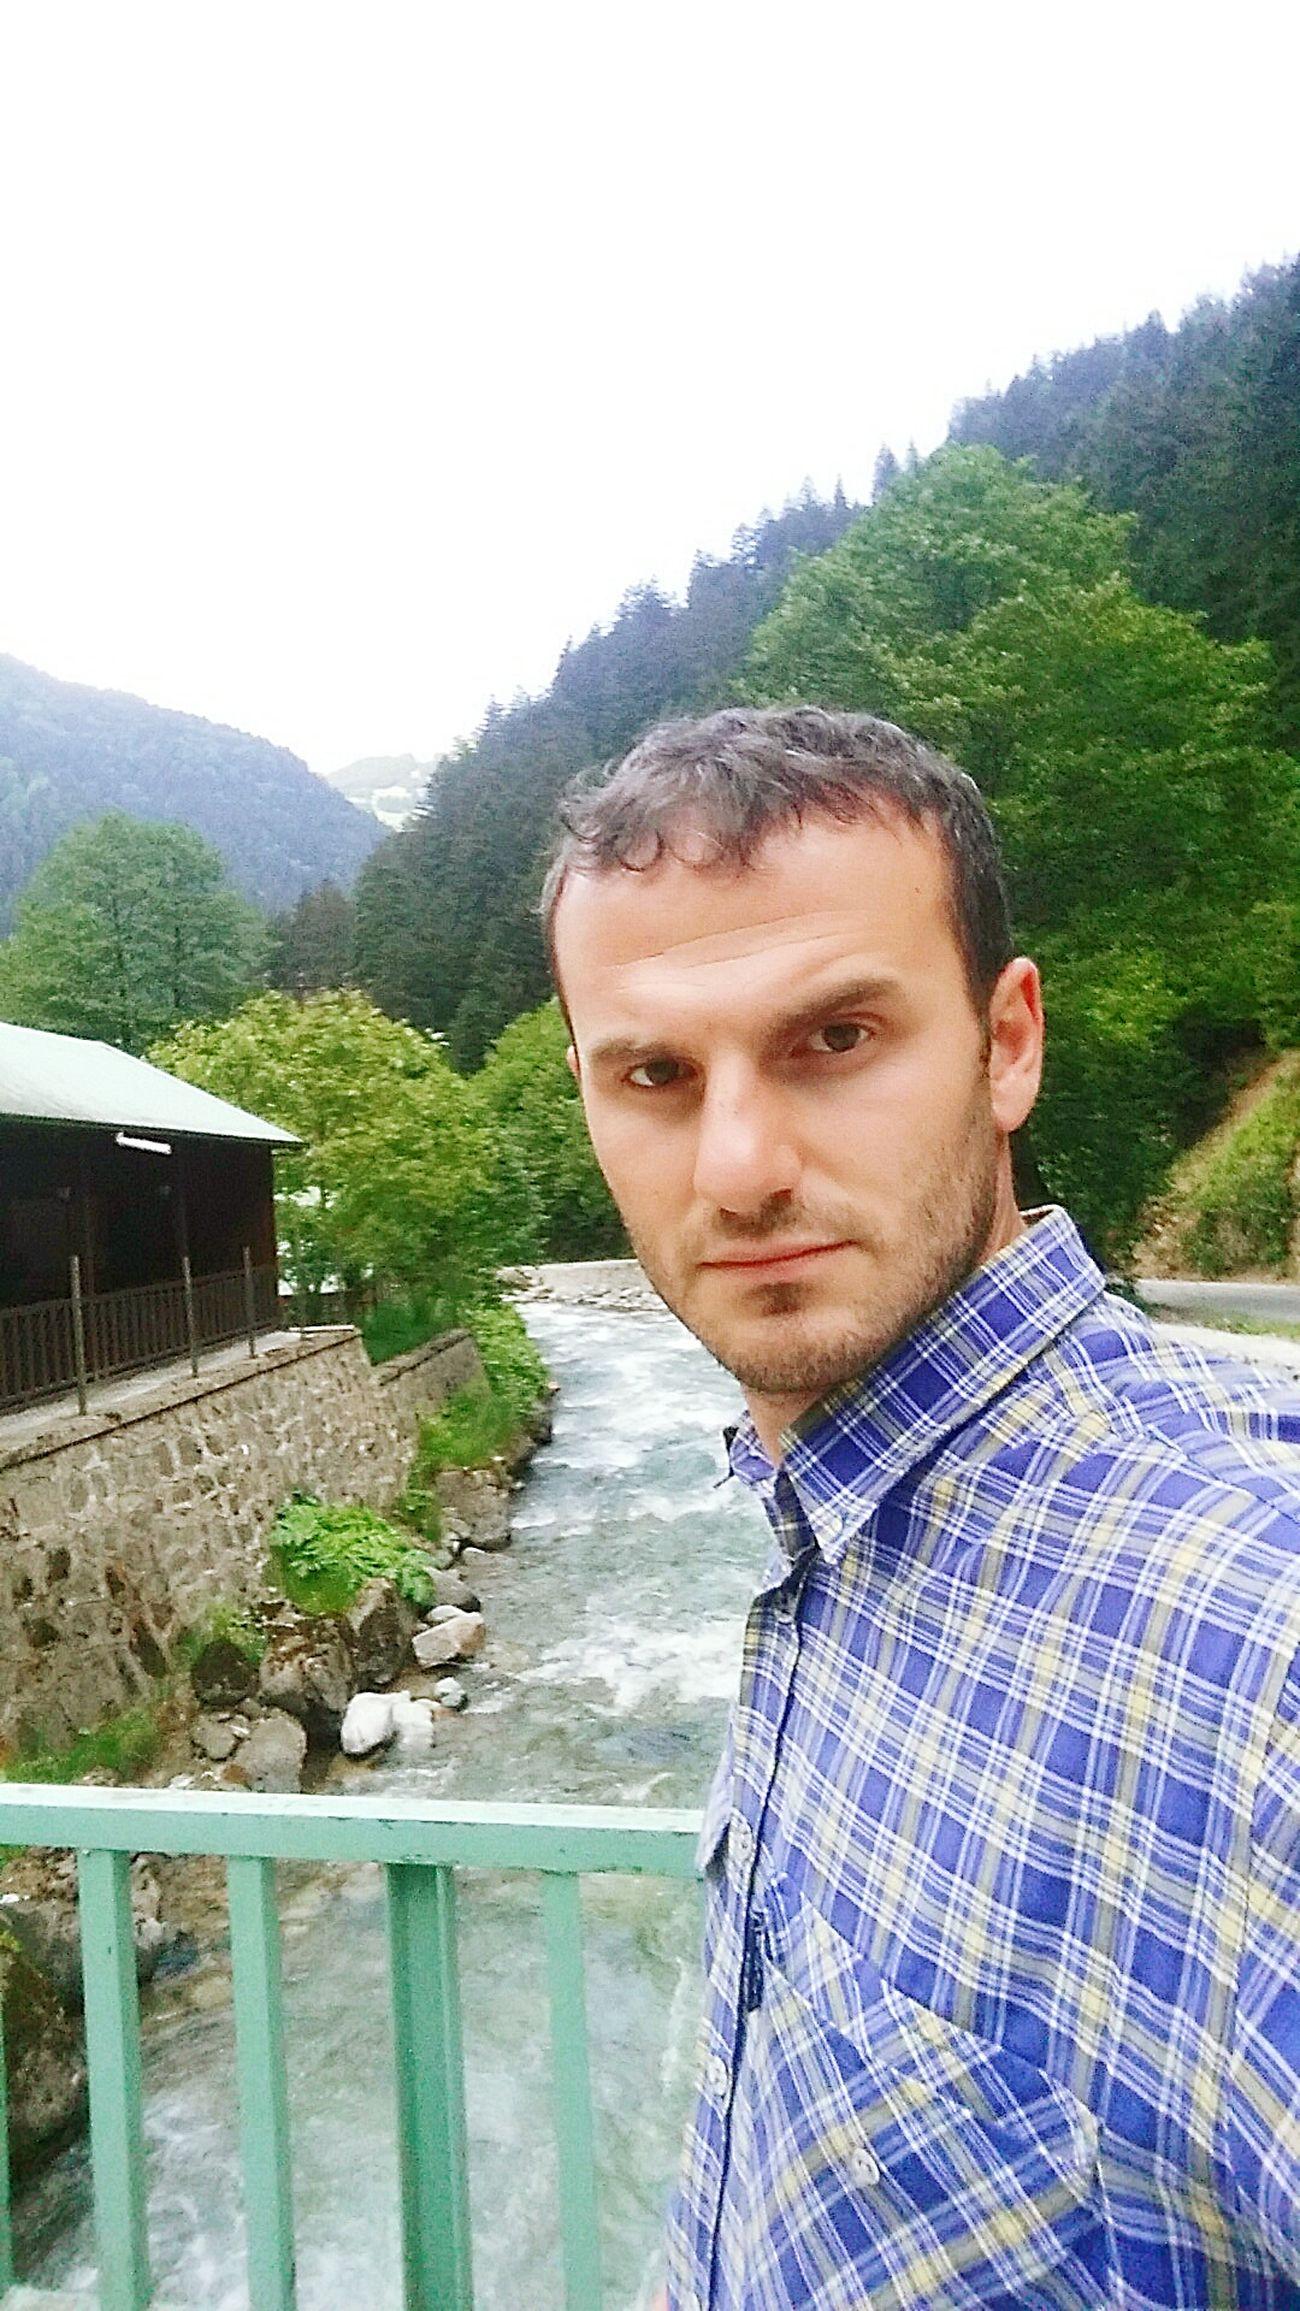 Trabzon Uzungol Turkey Dağ Vadi Yüksekrakım Trabzon Rize Selfie ✌